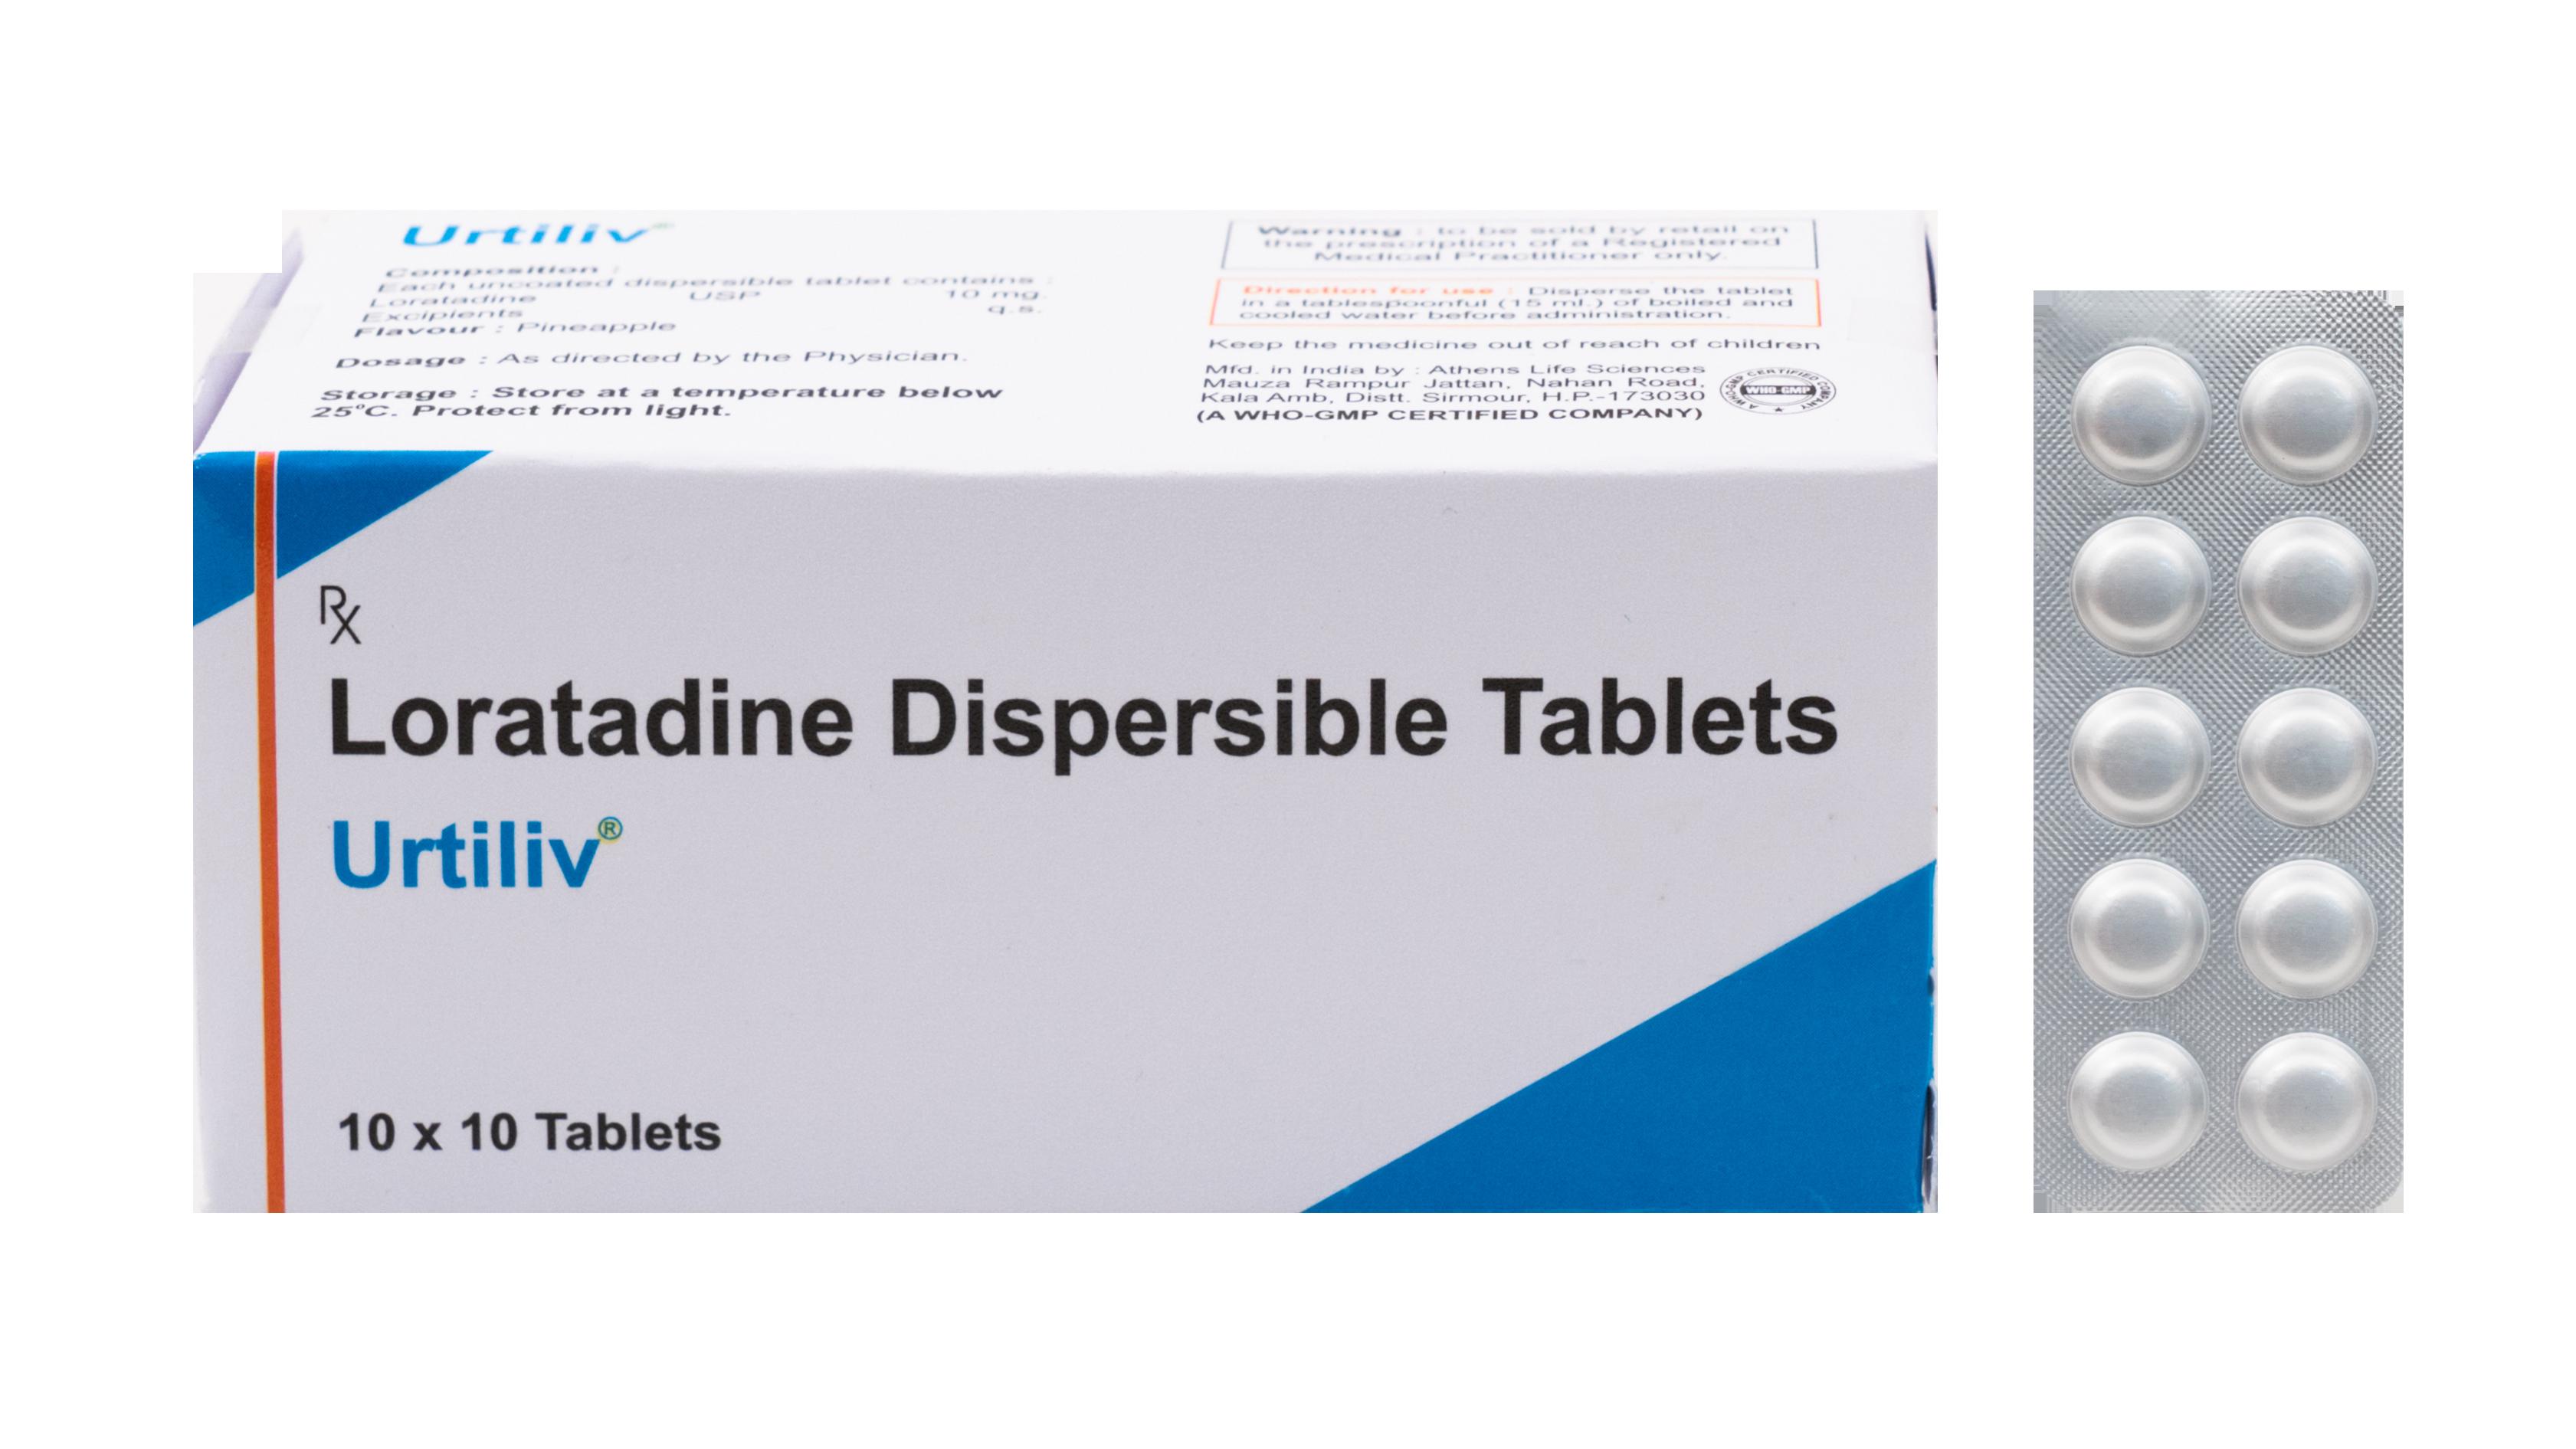 Loratadine 10mg Dispersible Tablet